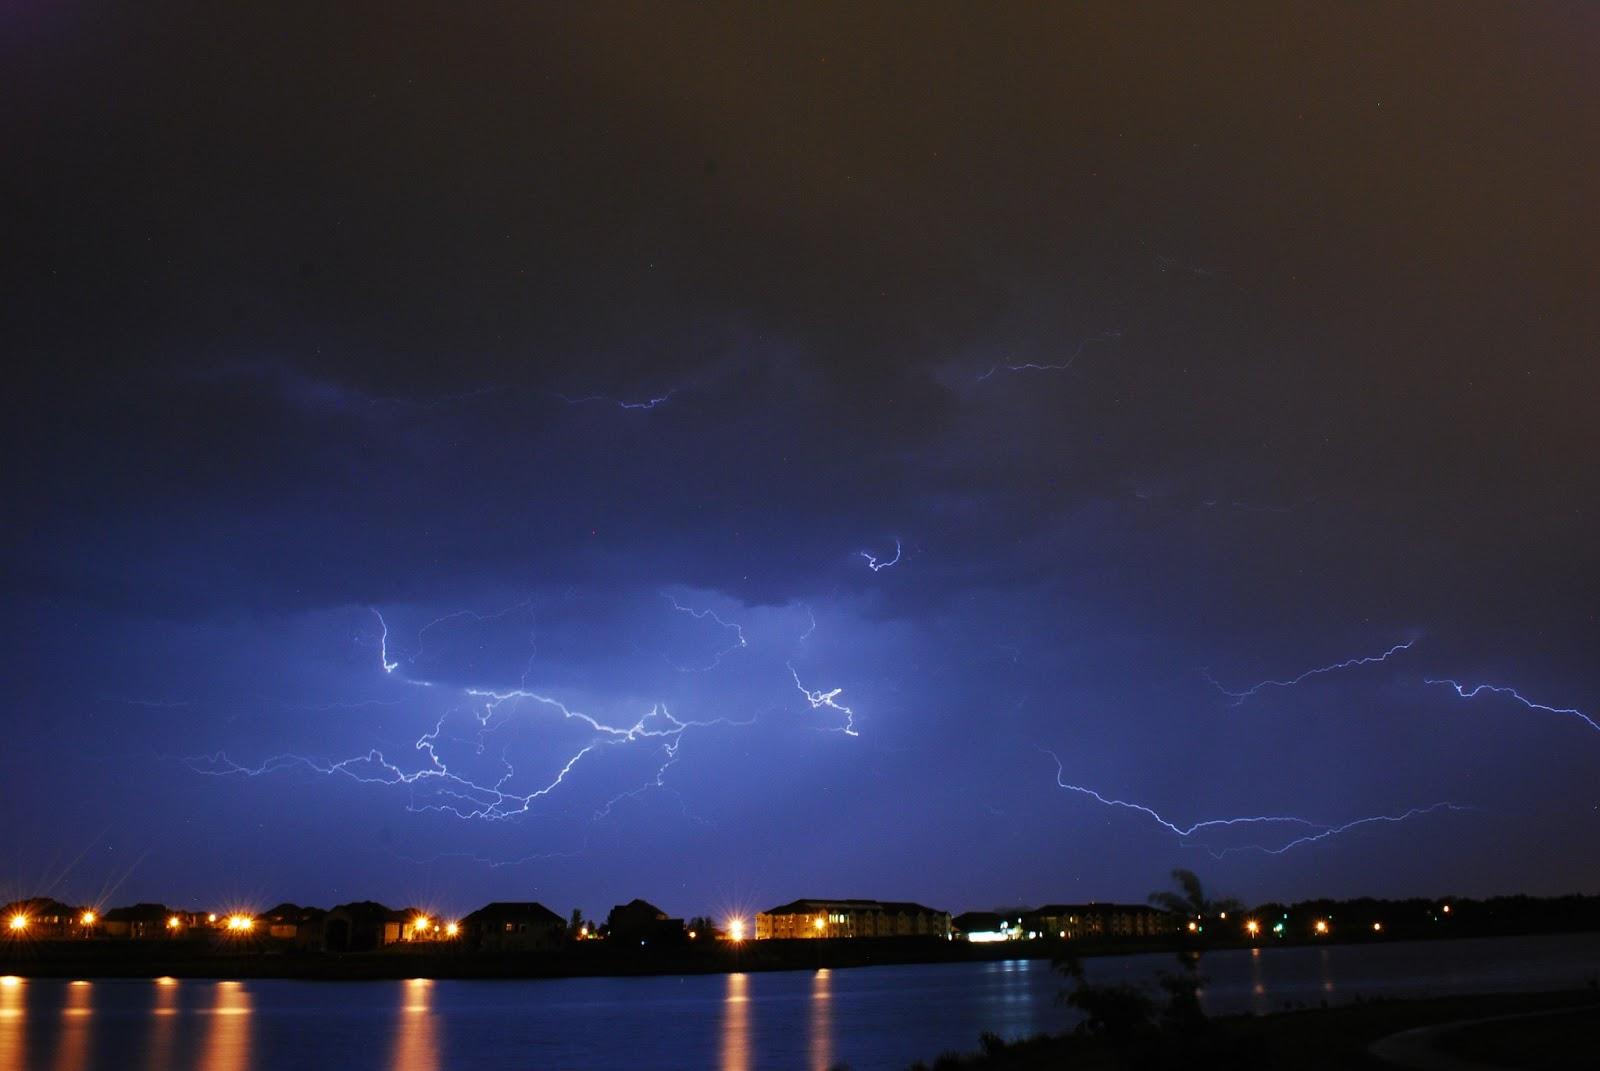 matt s blog got woke up last night from tornado sirens and when i